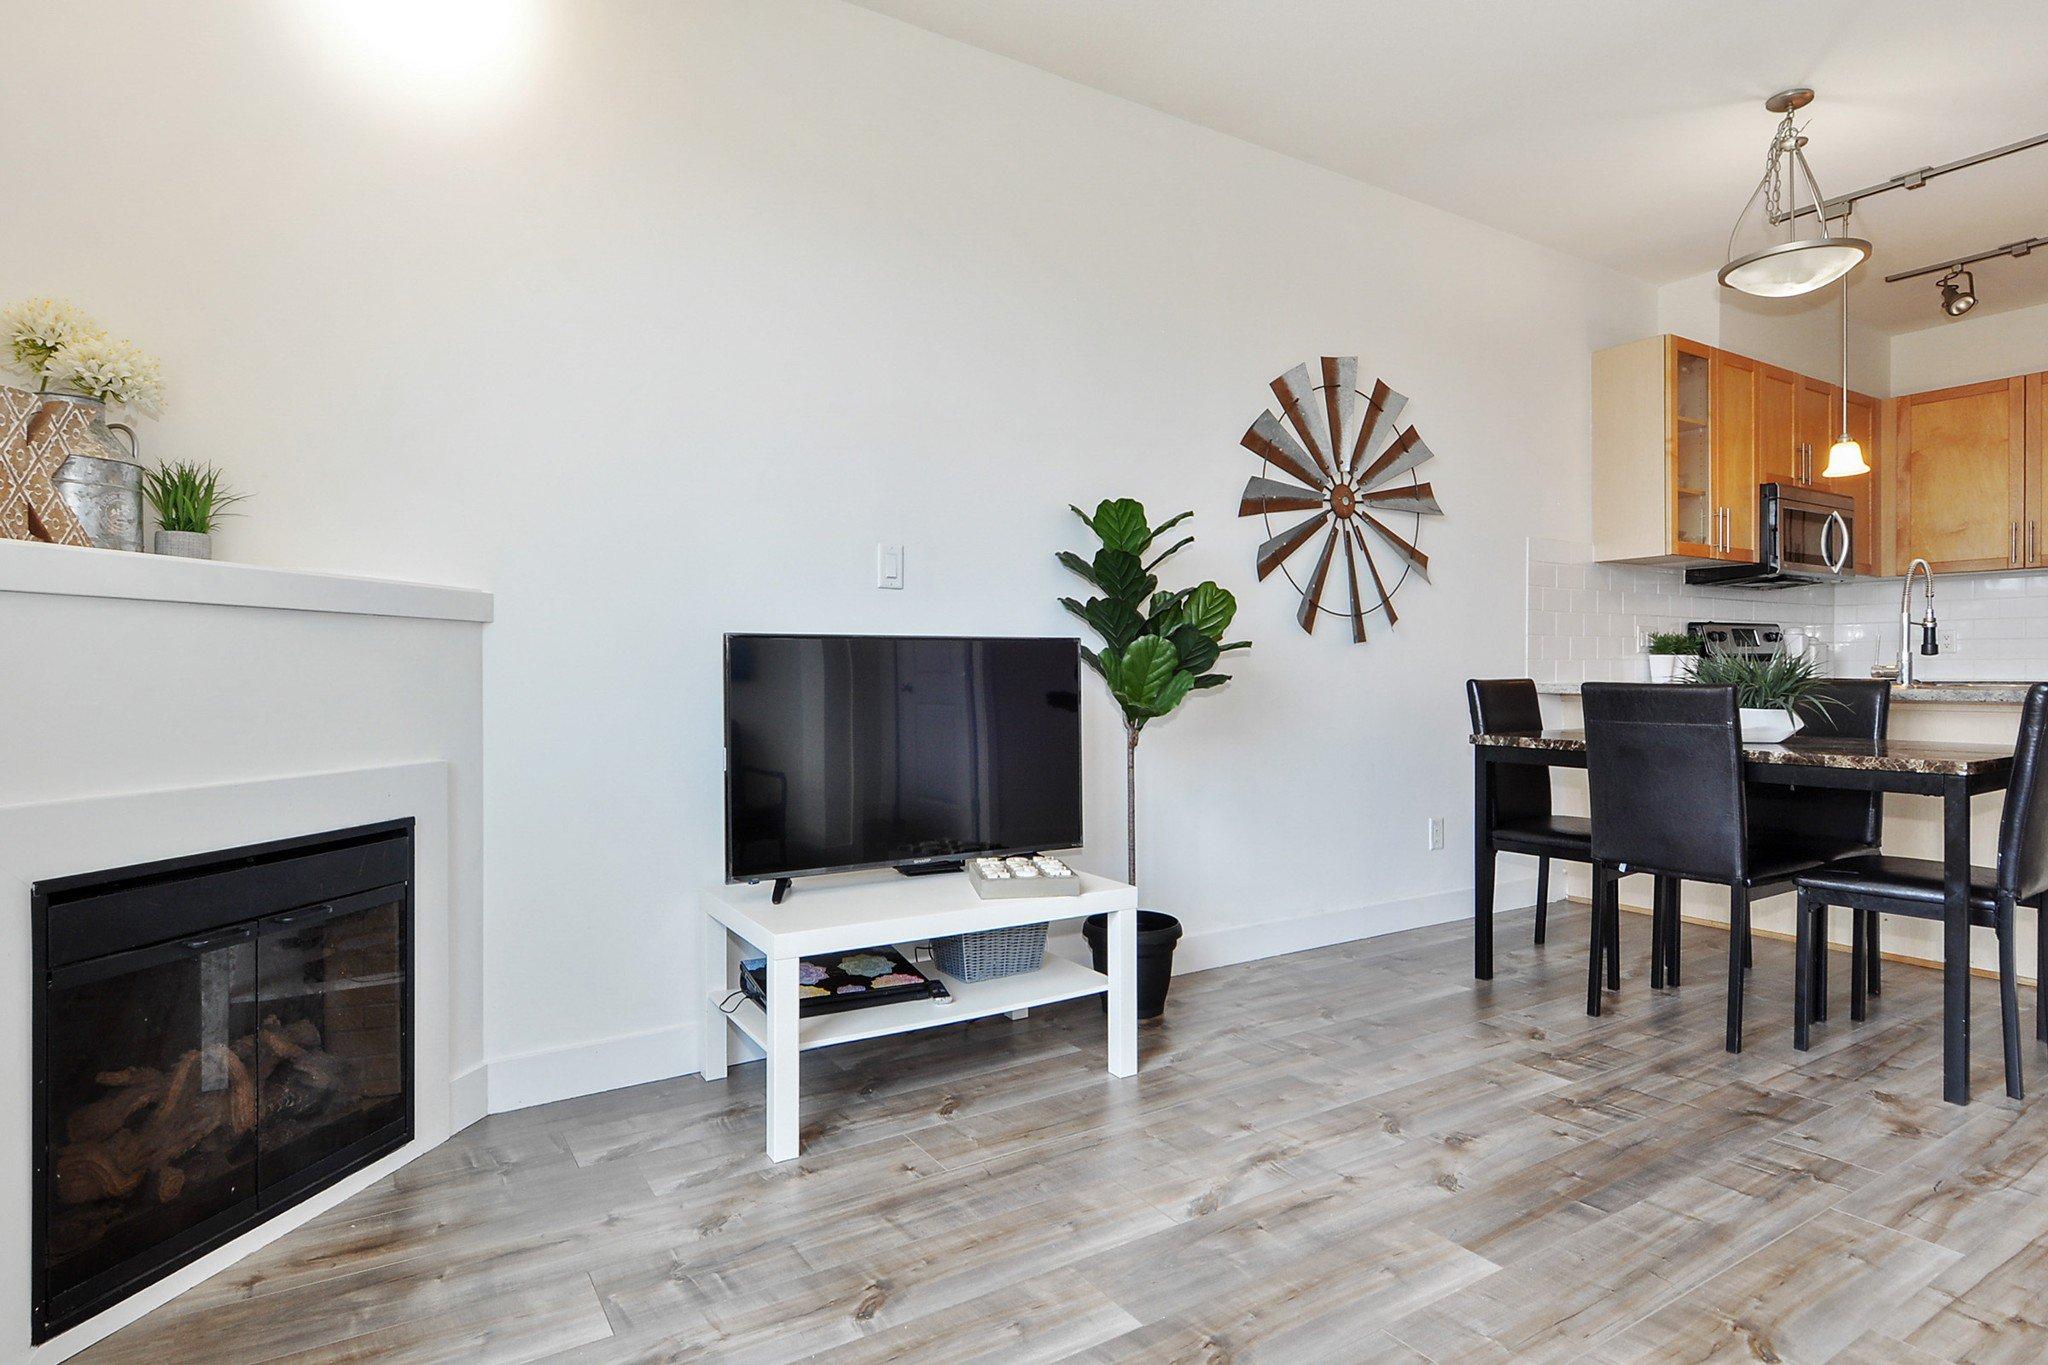 "Photo 4: Photos: 302 688 E 17TH Avenue in Vancouver: Fraser VE Condo for sale in ""MONDELLA"" (Vancouver East)  : MLS®# R2403902"